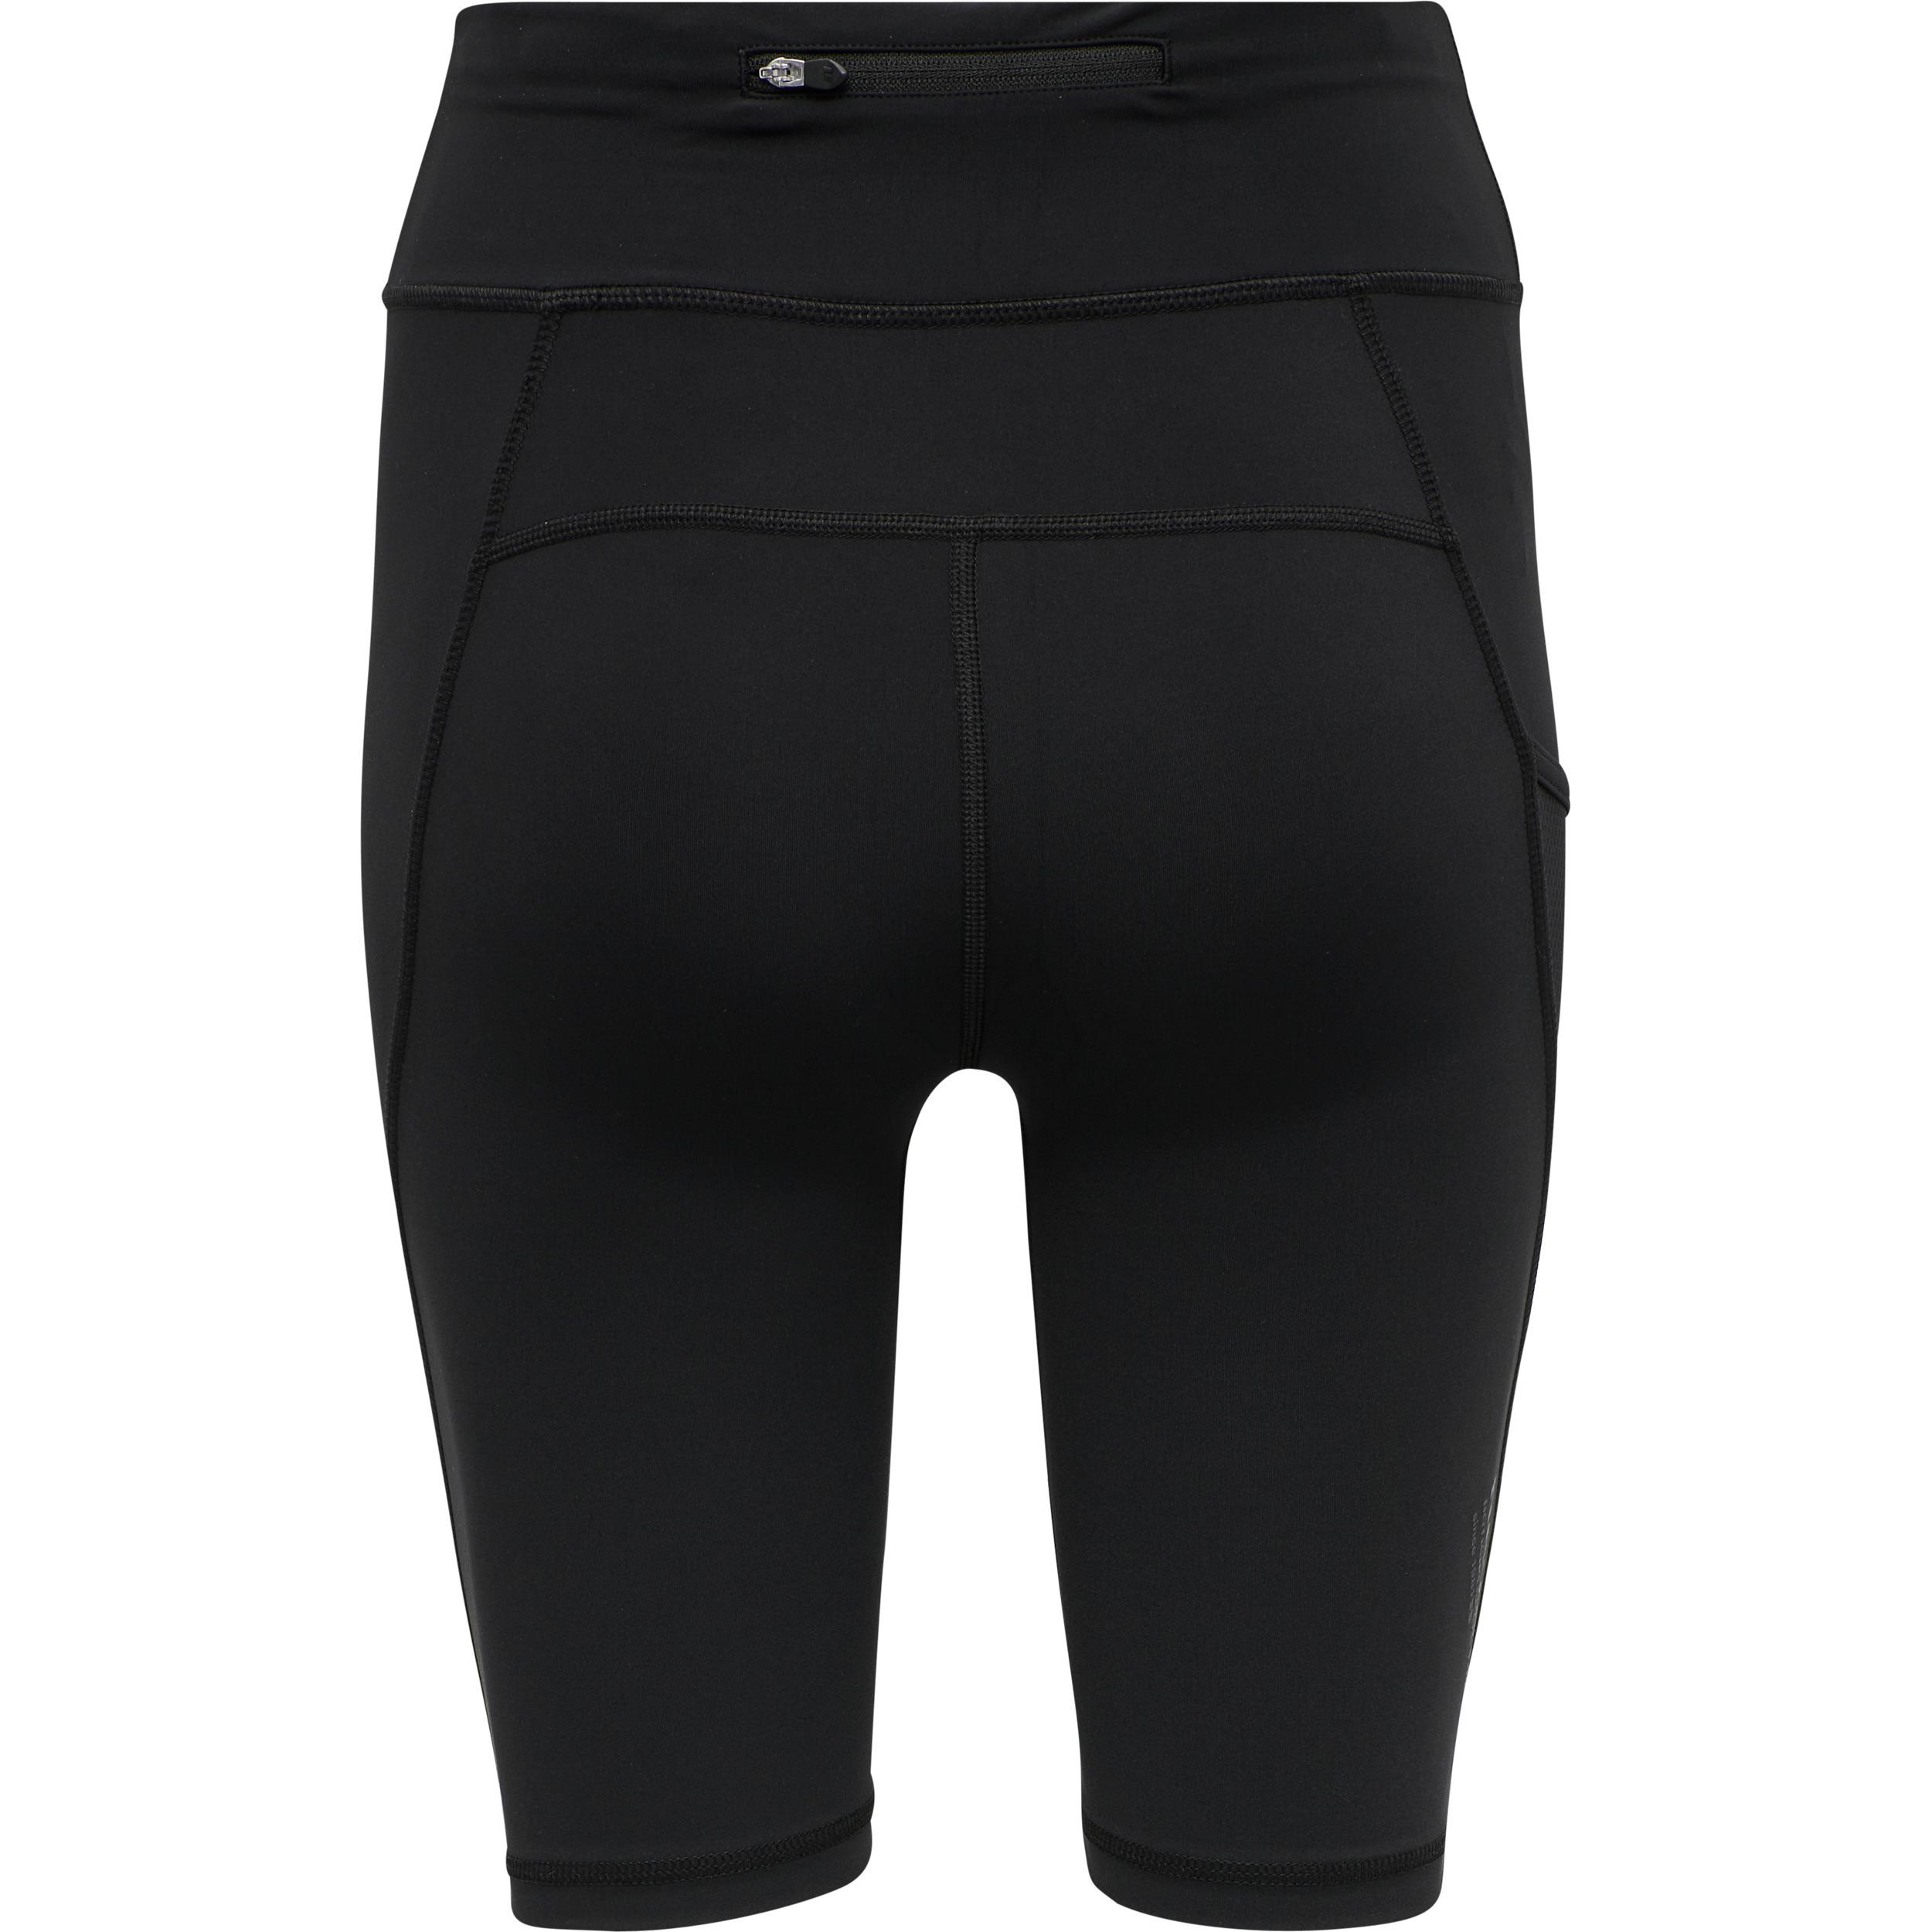 Newline W Højtaljede Sprinter shorts, black, large